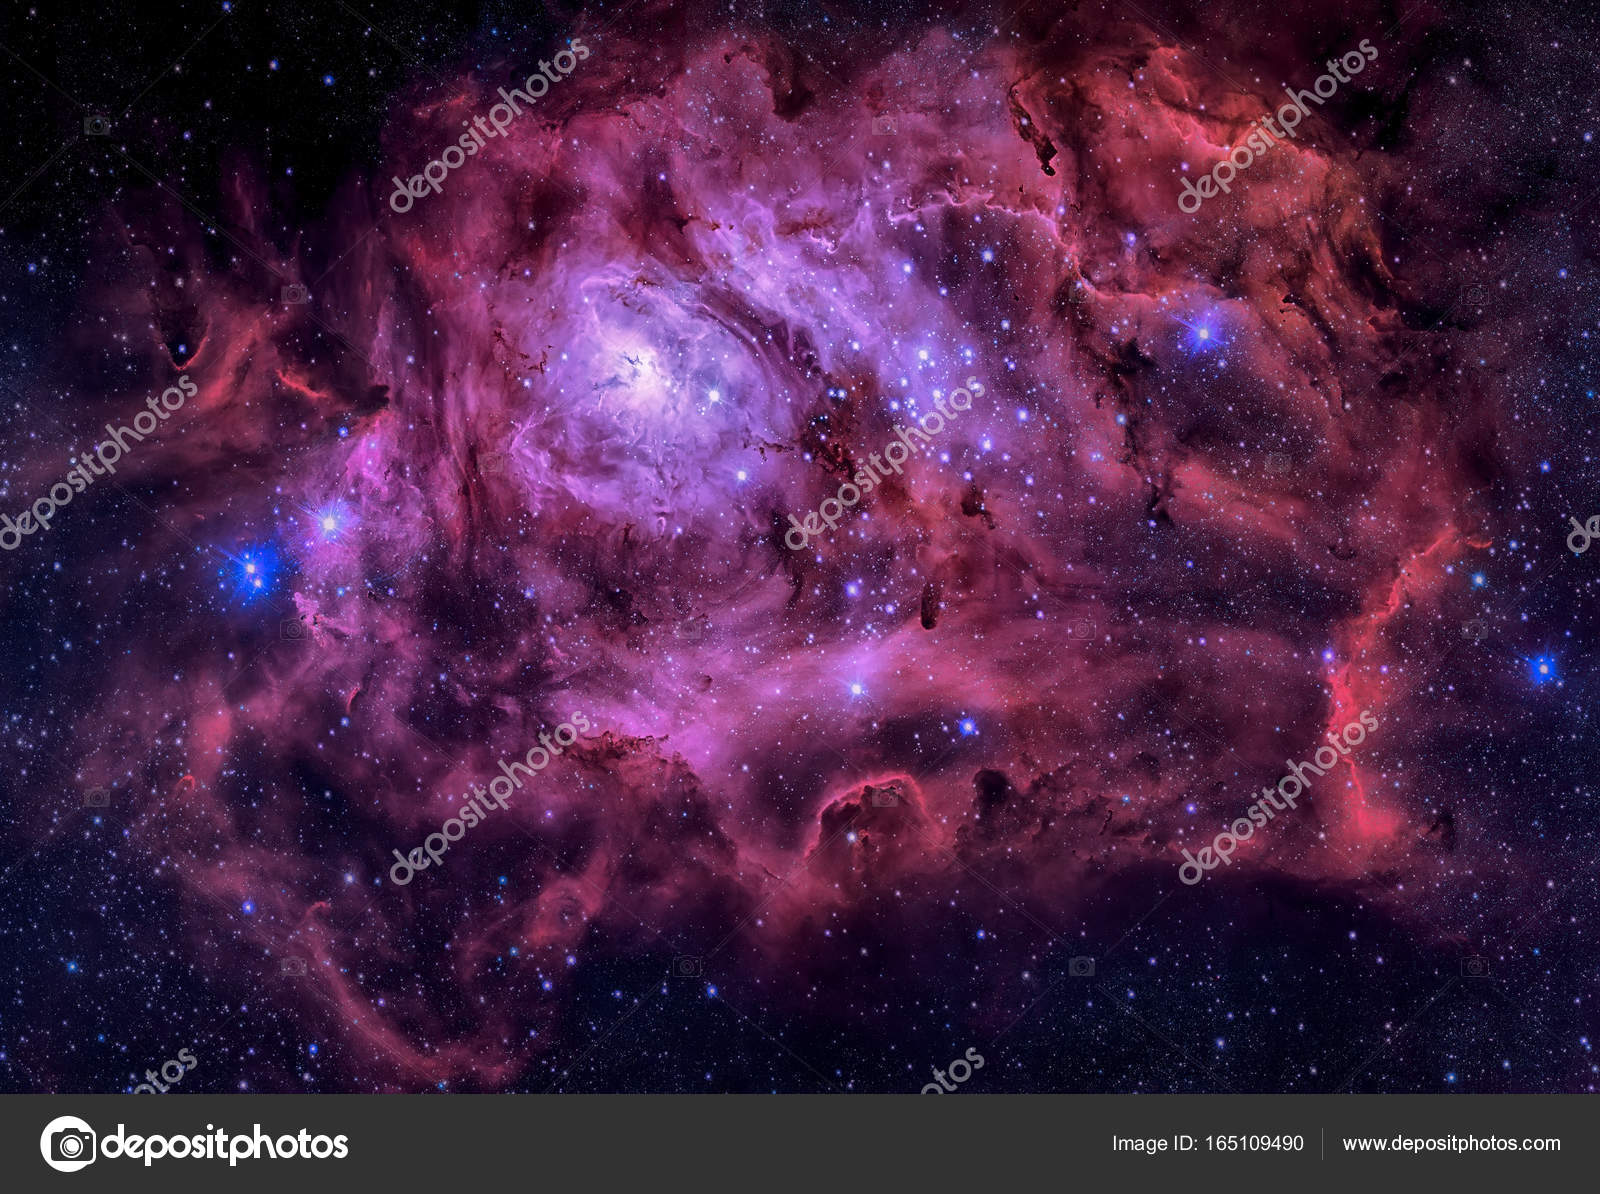 Lagoon Nebula located in the constellation Sagittarius